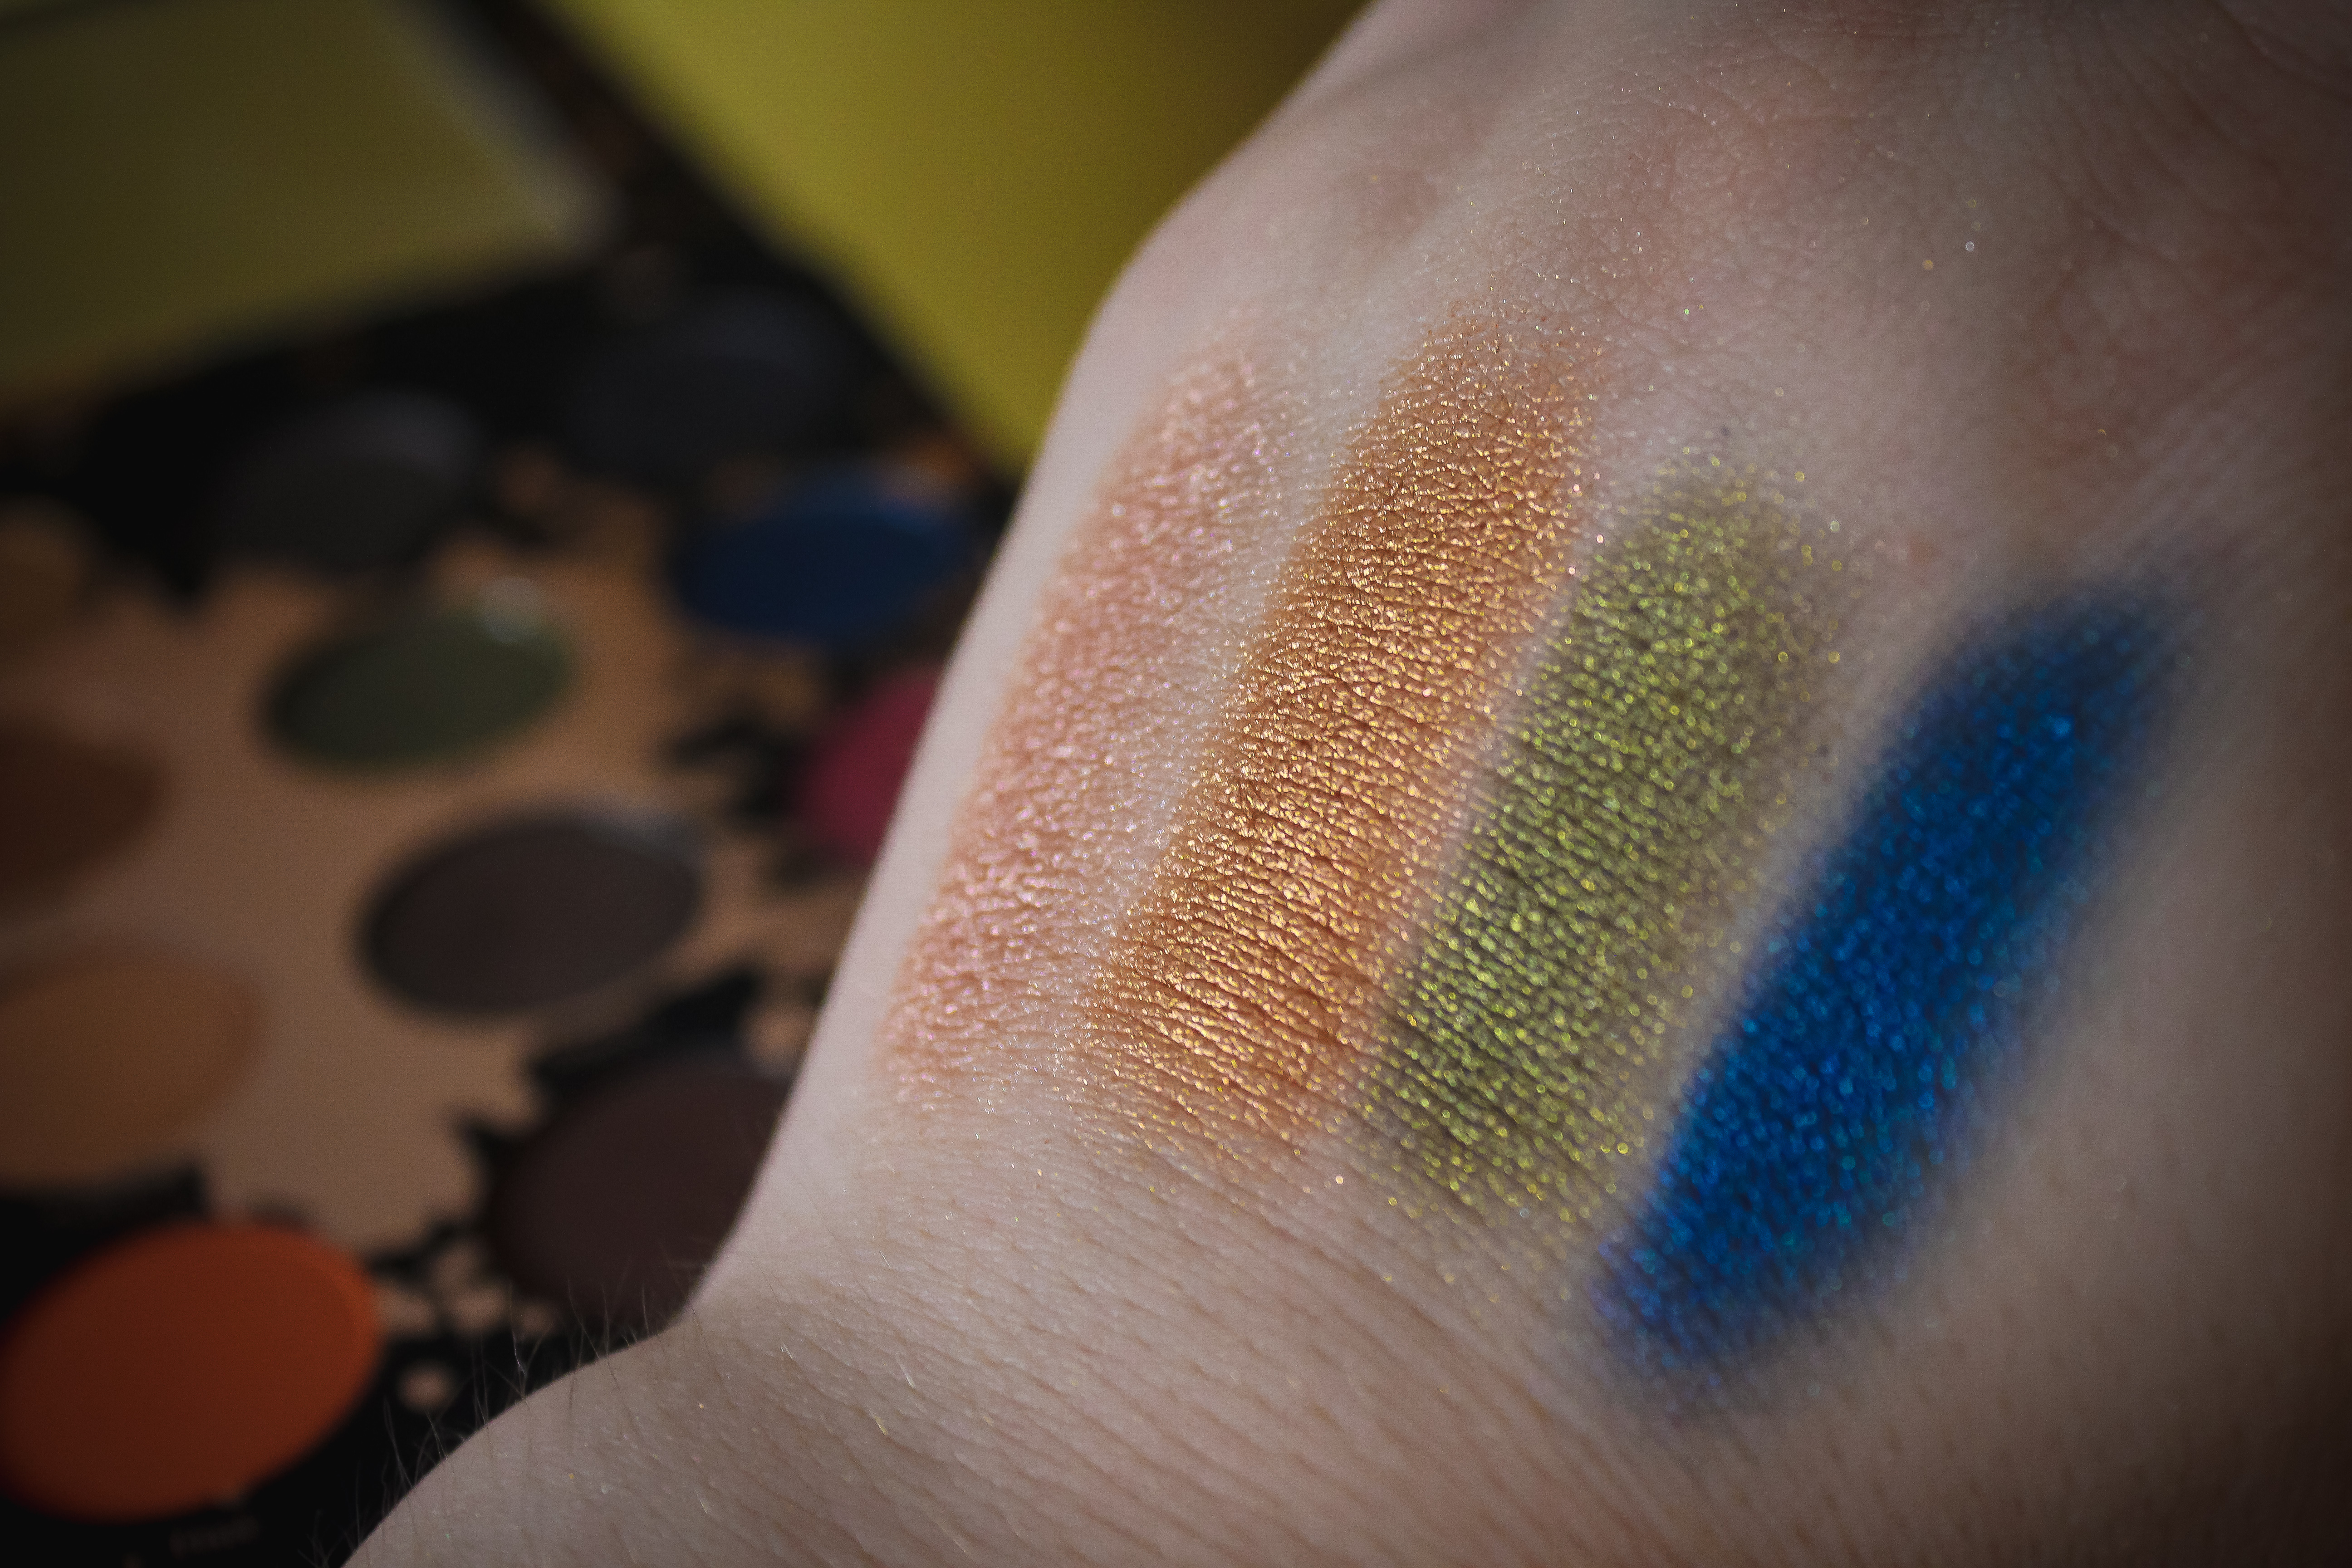 ColourPop Shayla Perception Palette Row 2